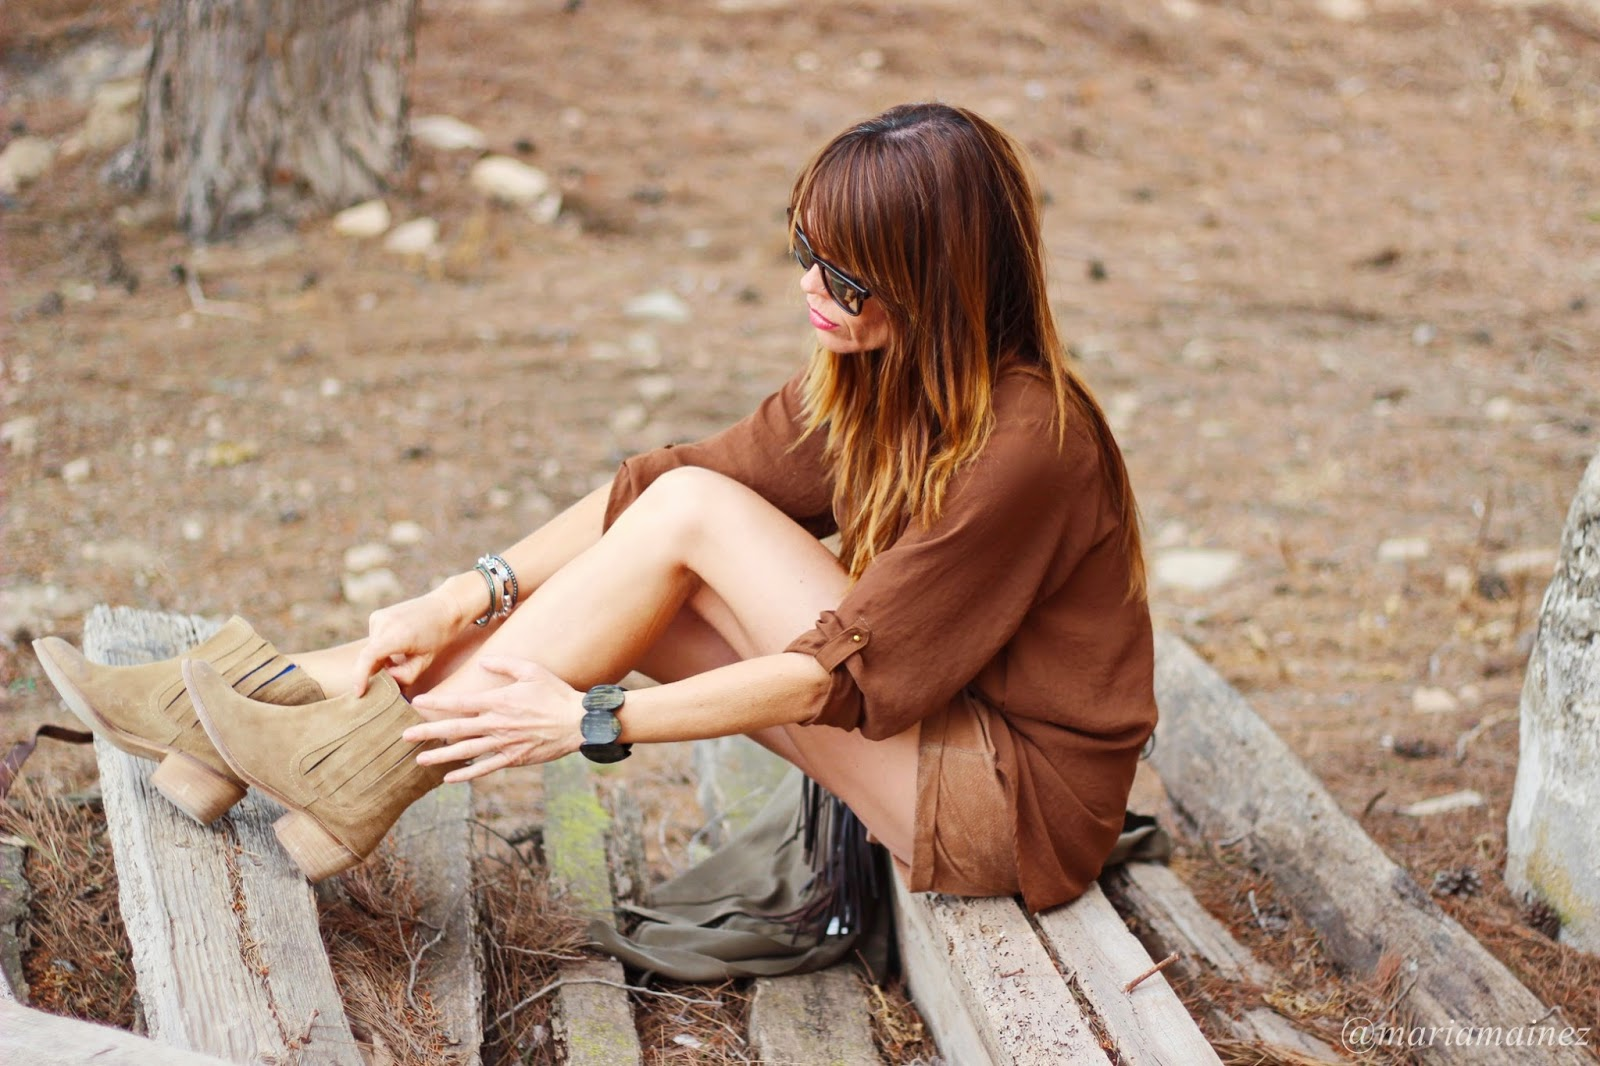 Streetstyle - Tabatha shoes - botines de verano - Gabardina de verano